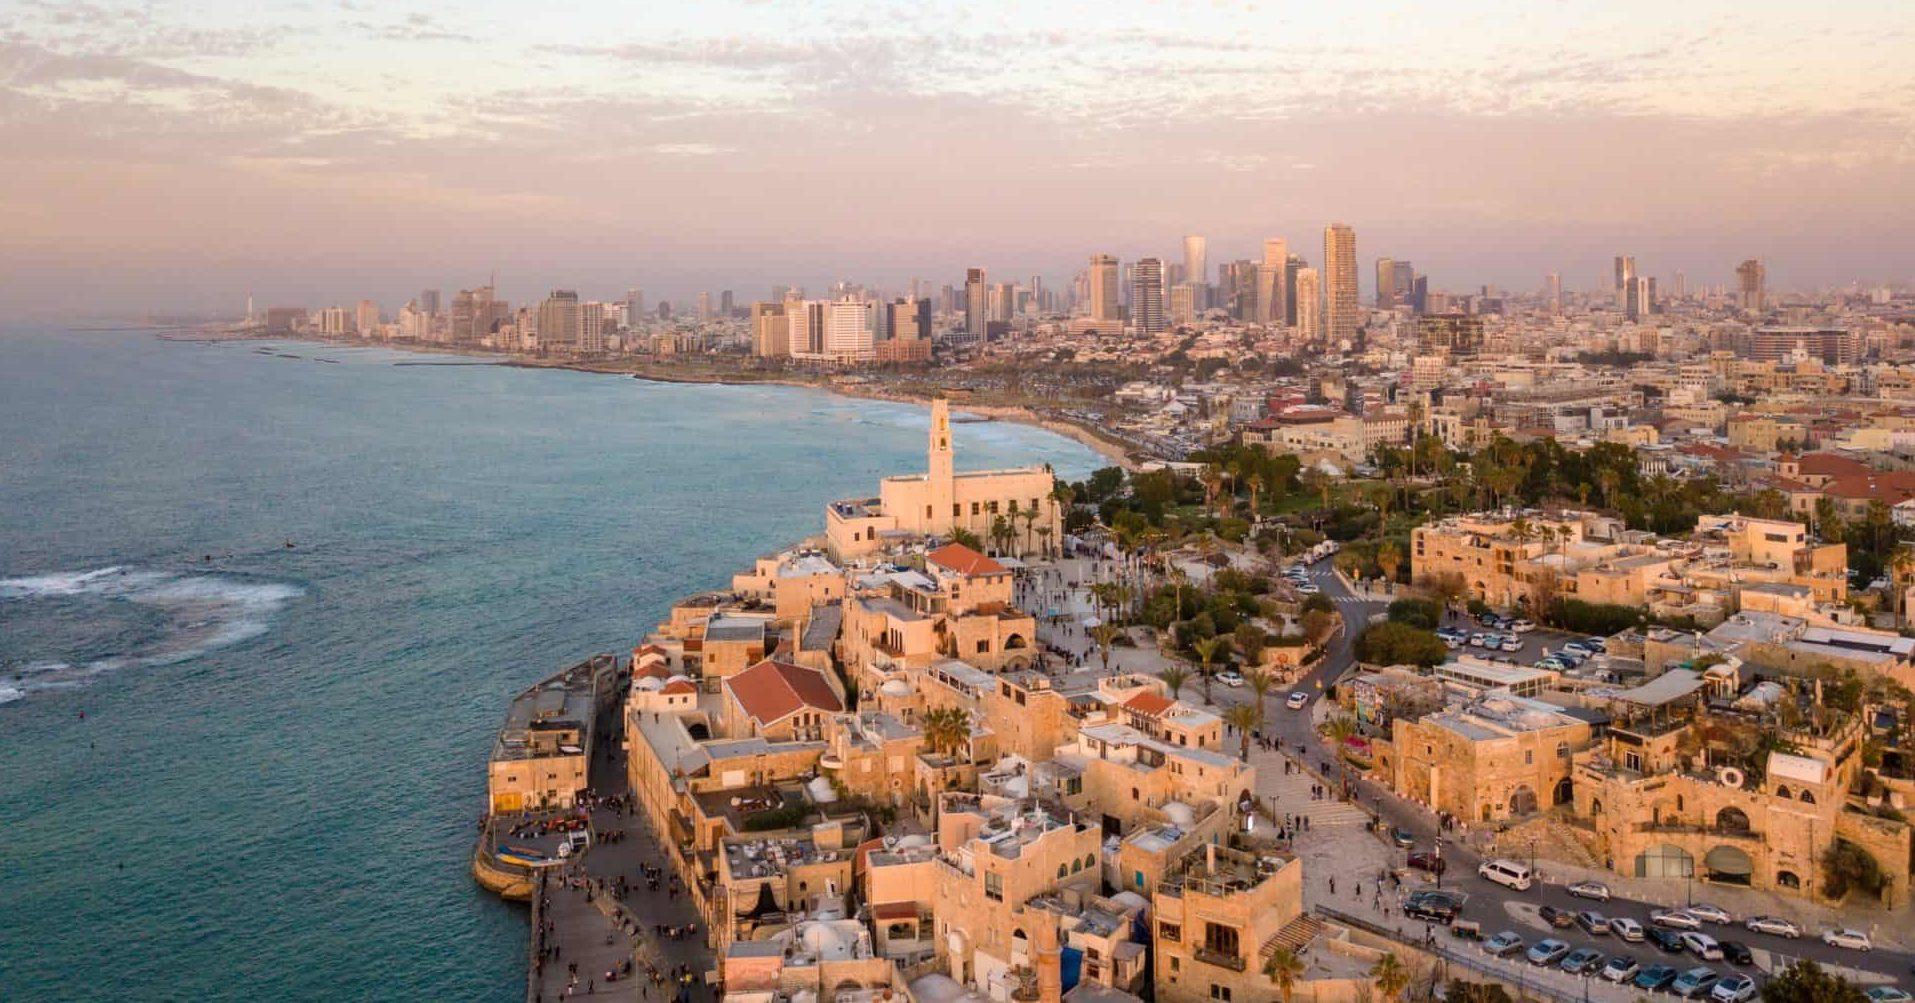 Lo skyline di Tel Aviv